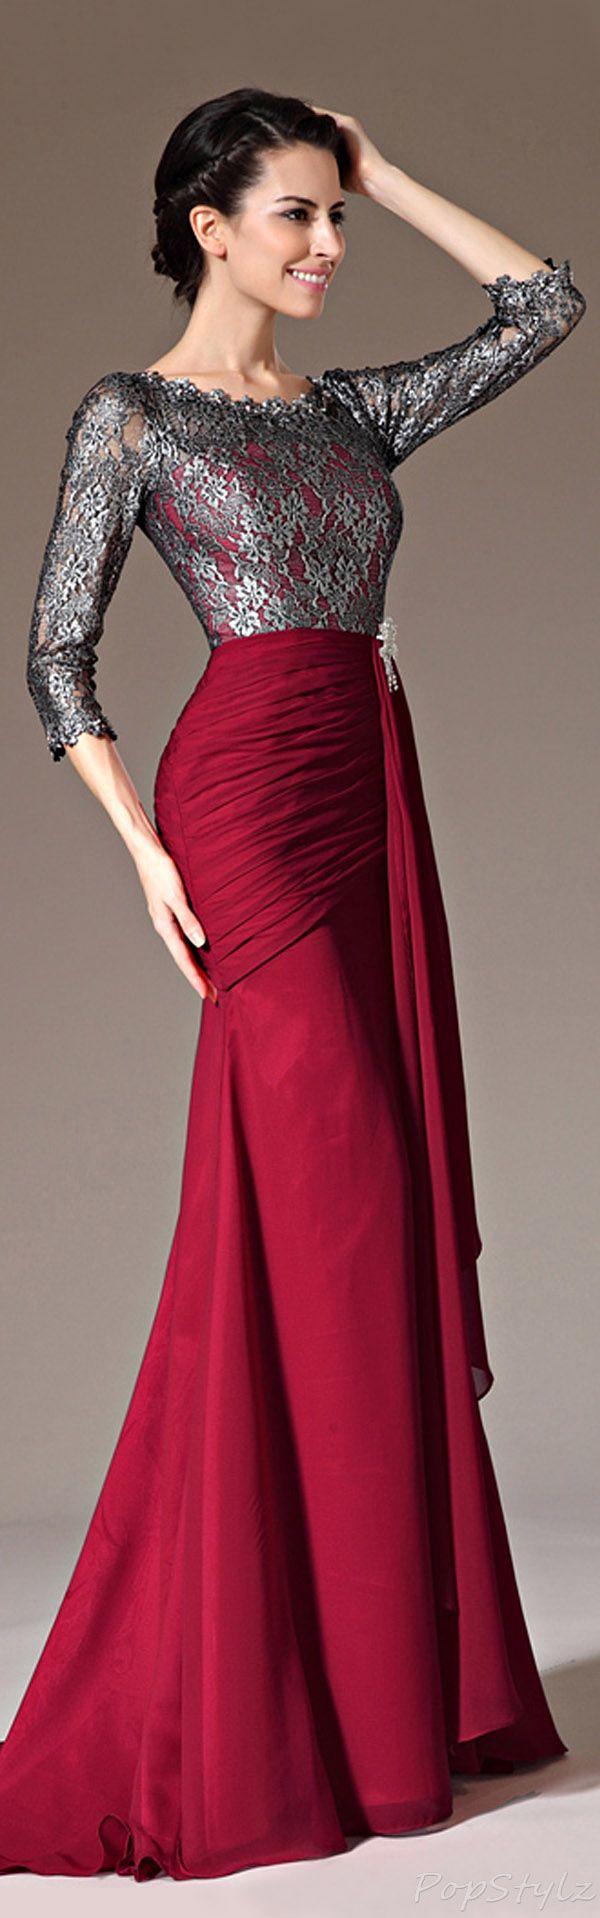 eDressit Lace Top Dress